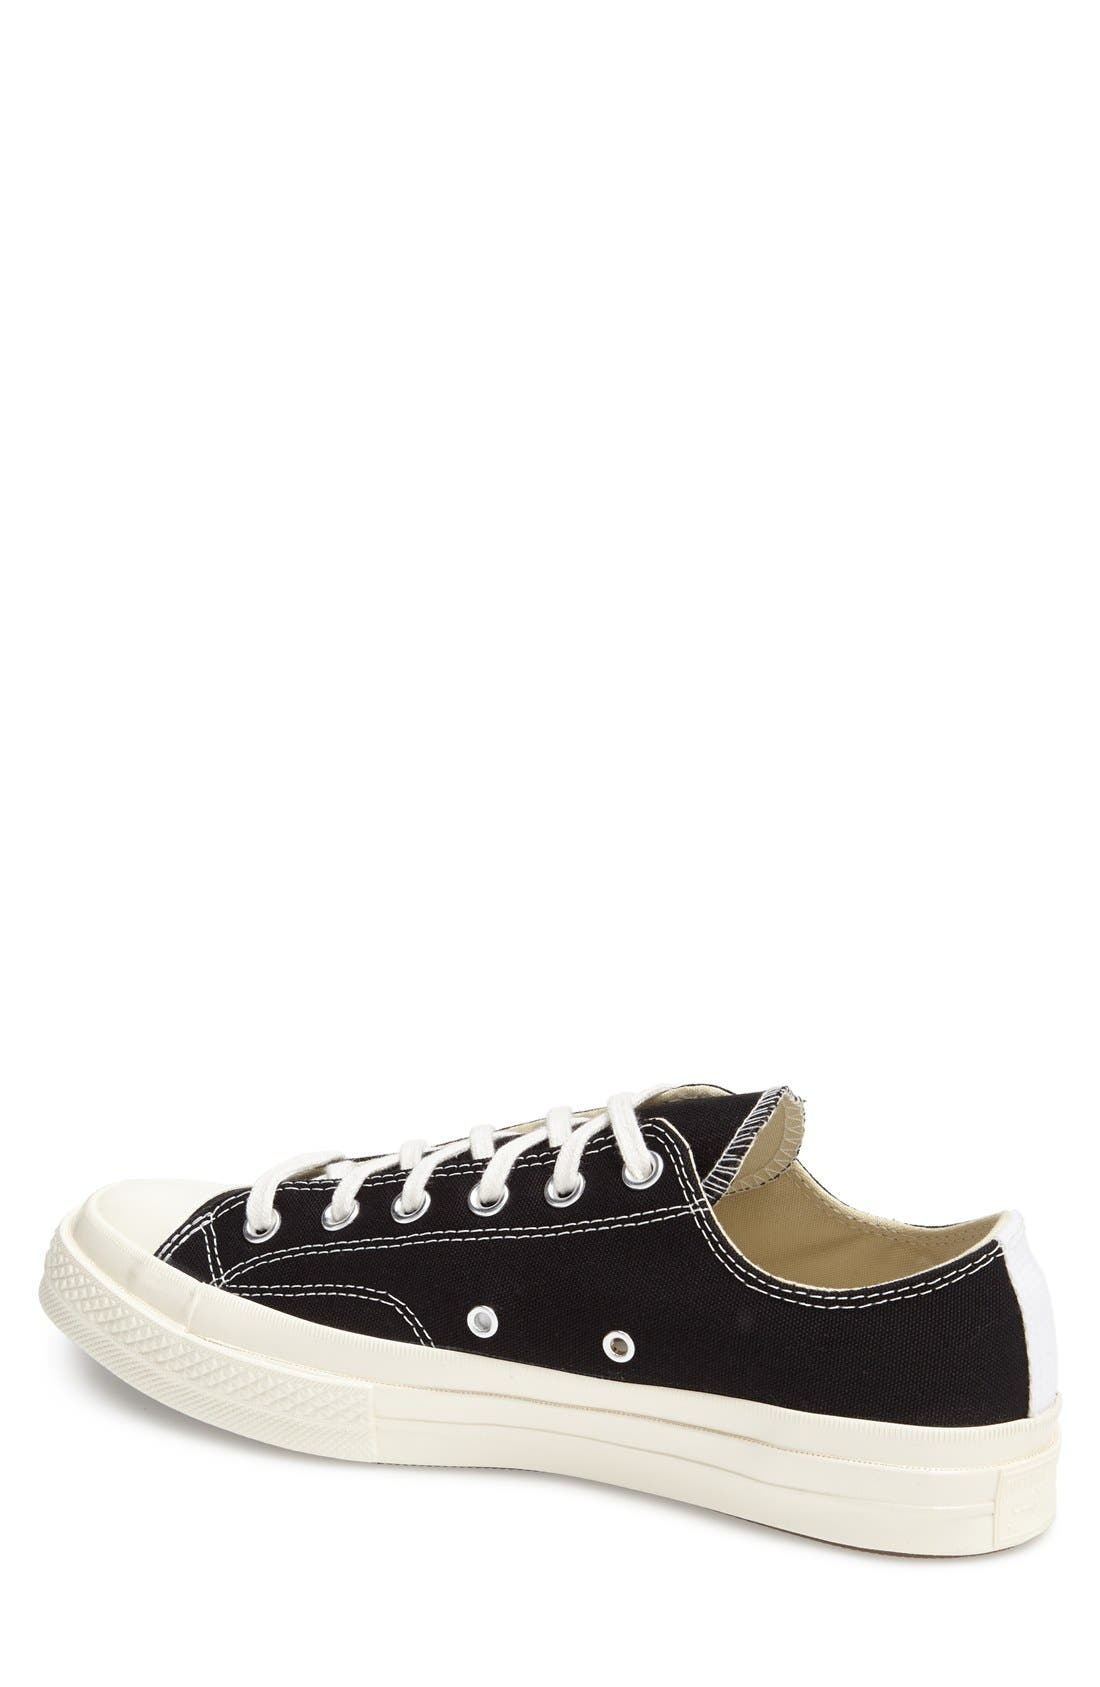 Men S Sneakers Athletic Tennis Shoes Nordstrom